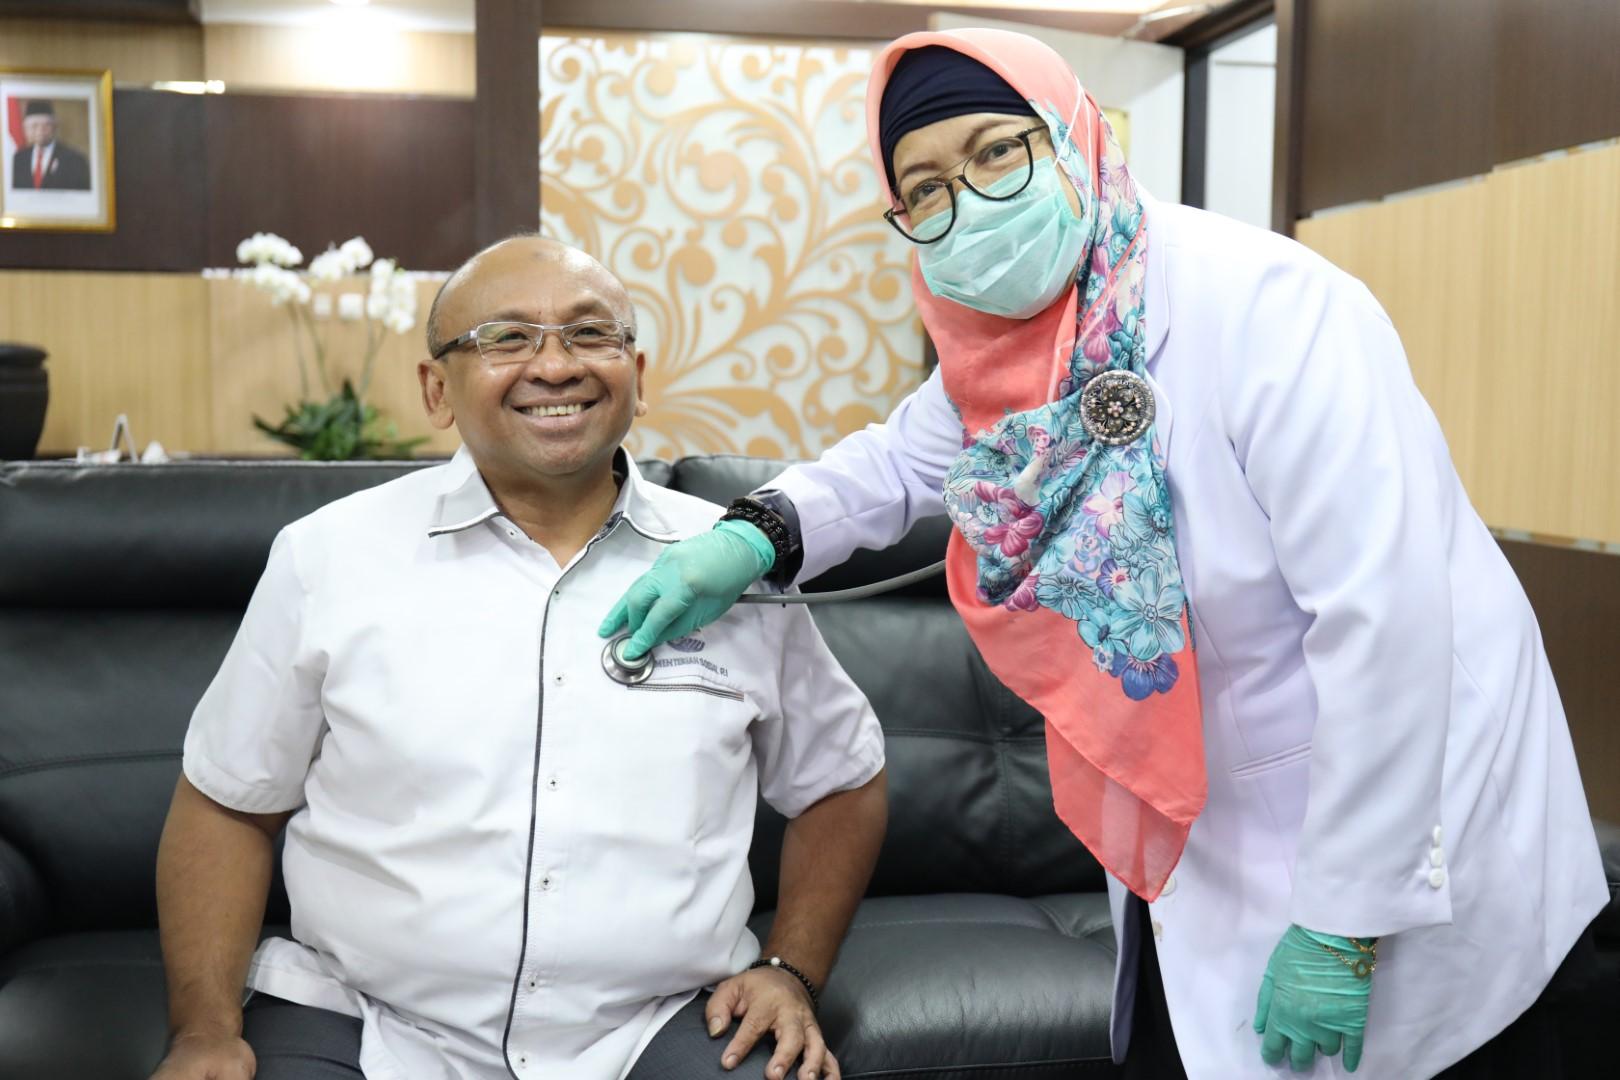 Pelaksanaan Kunjungan Dokter Klinik Utama di Kementerian Sosial